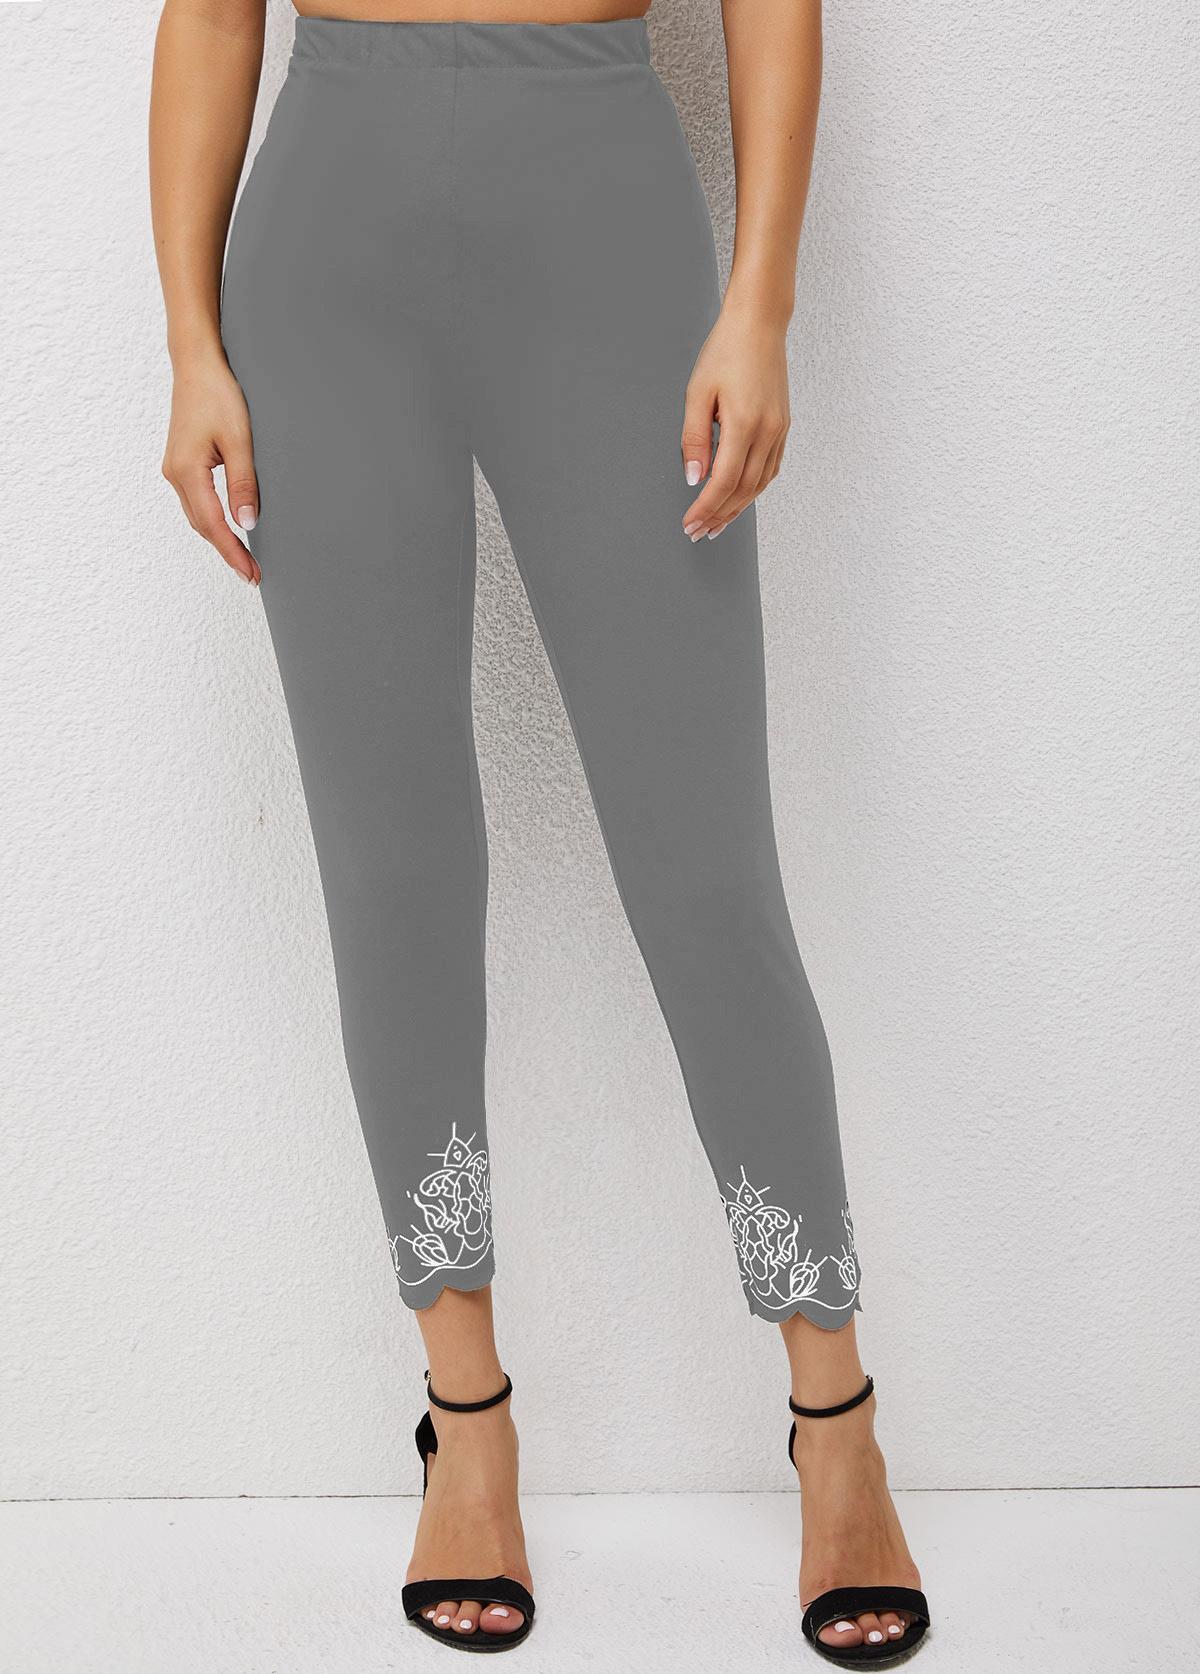 High Waisted Skinny Pierced Printed Pants